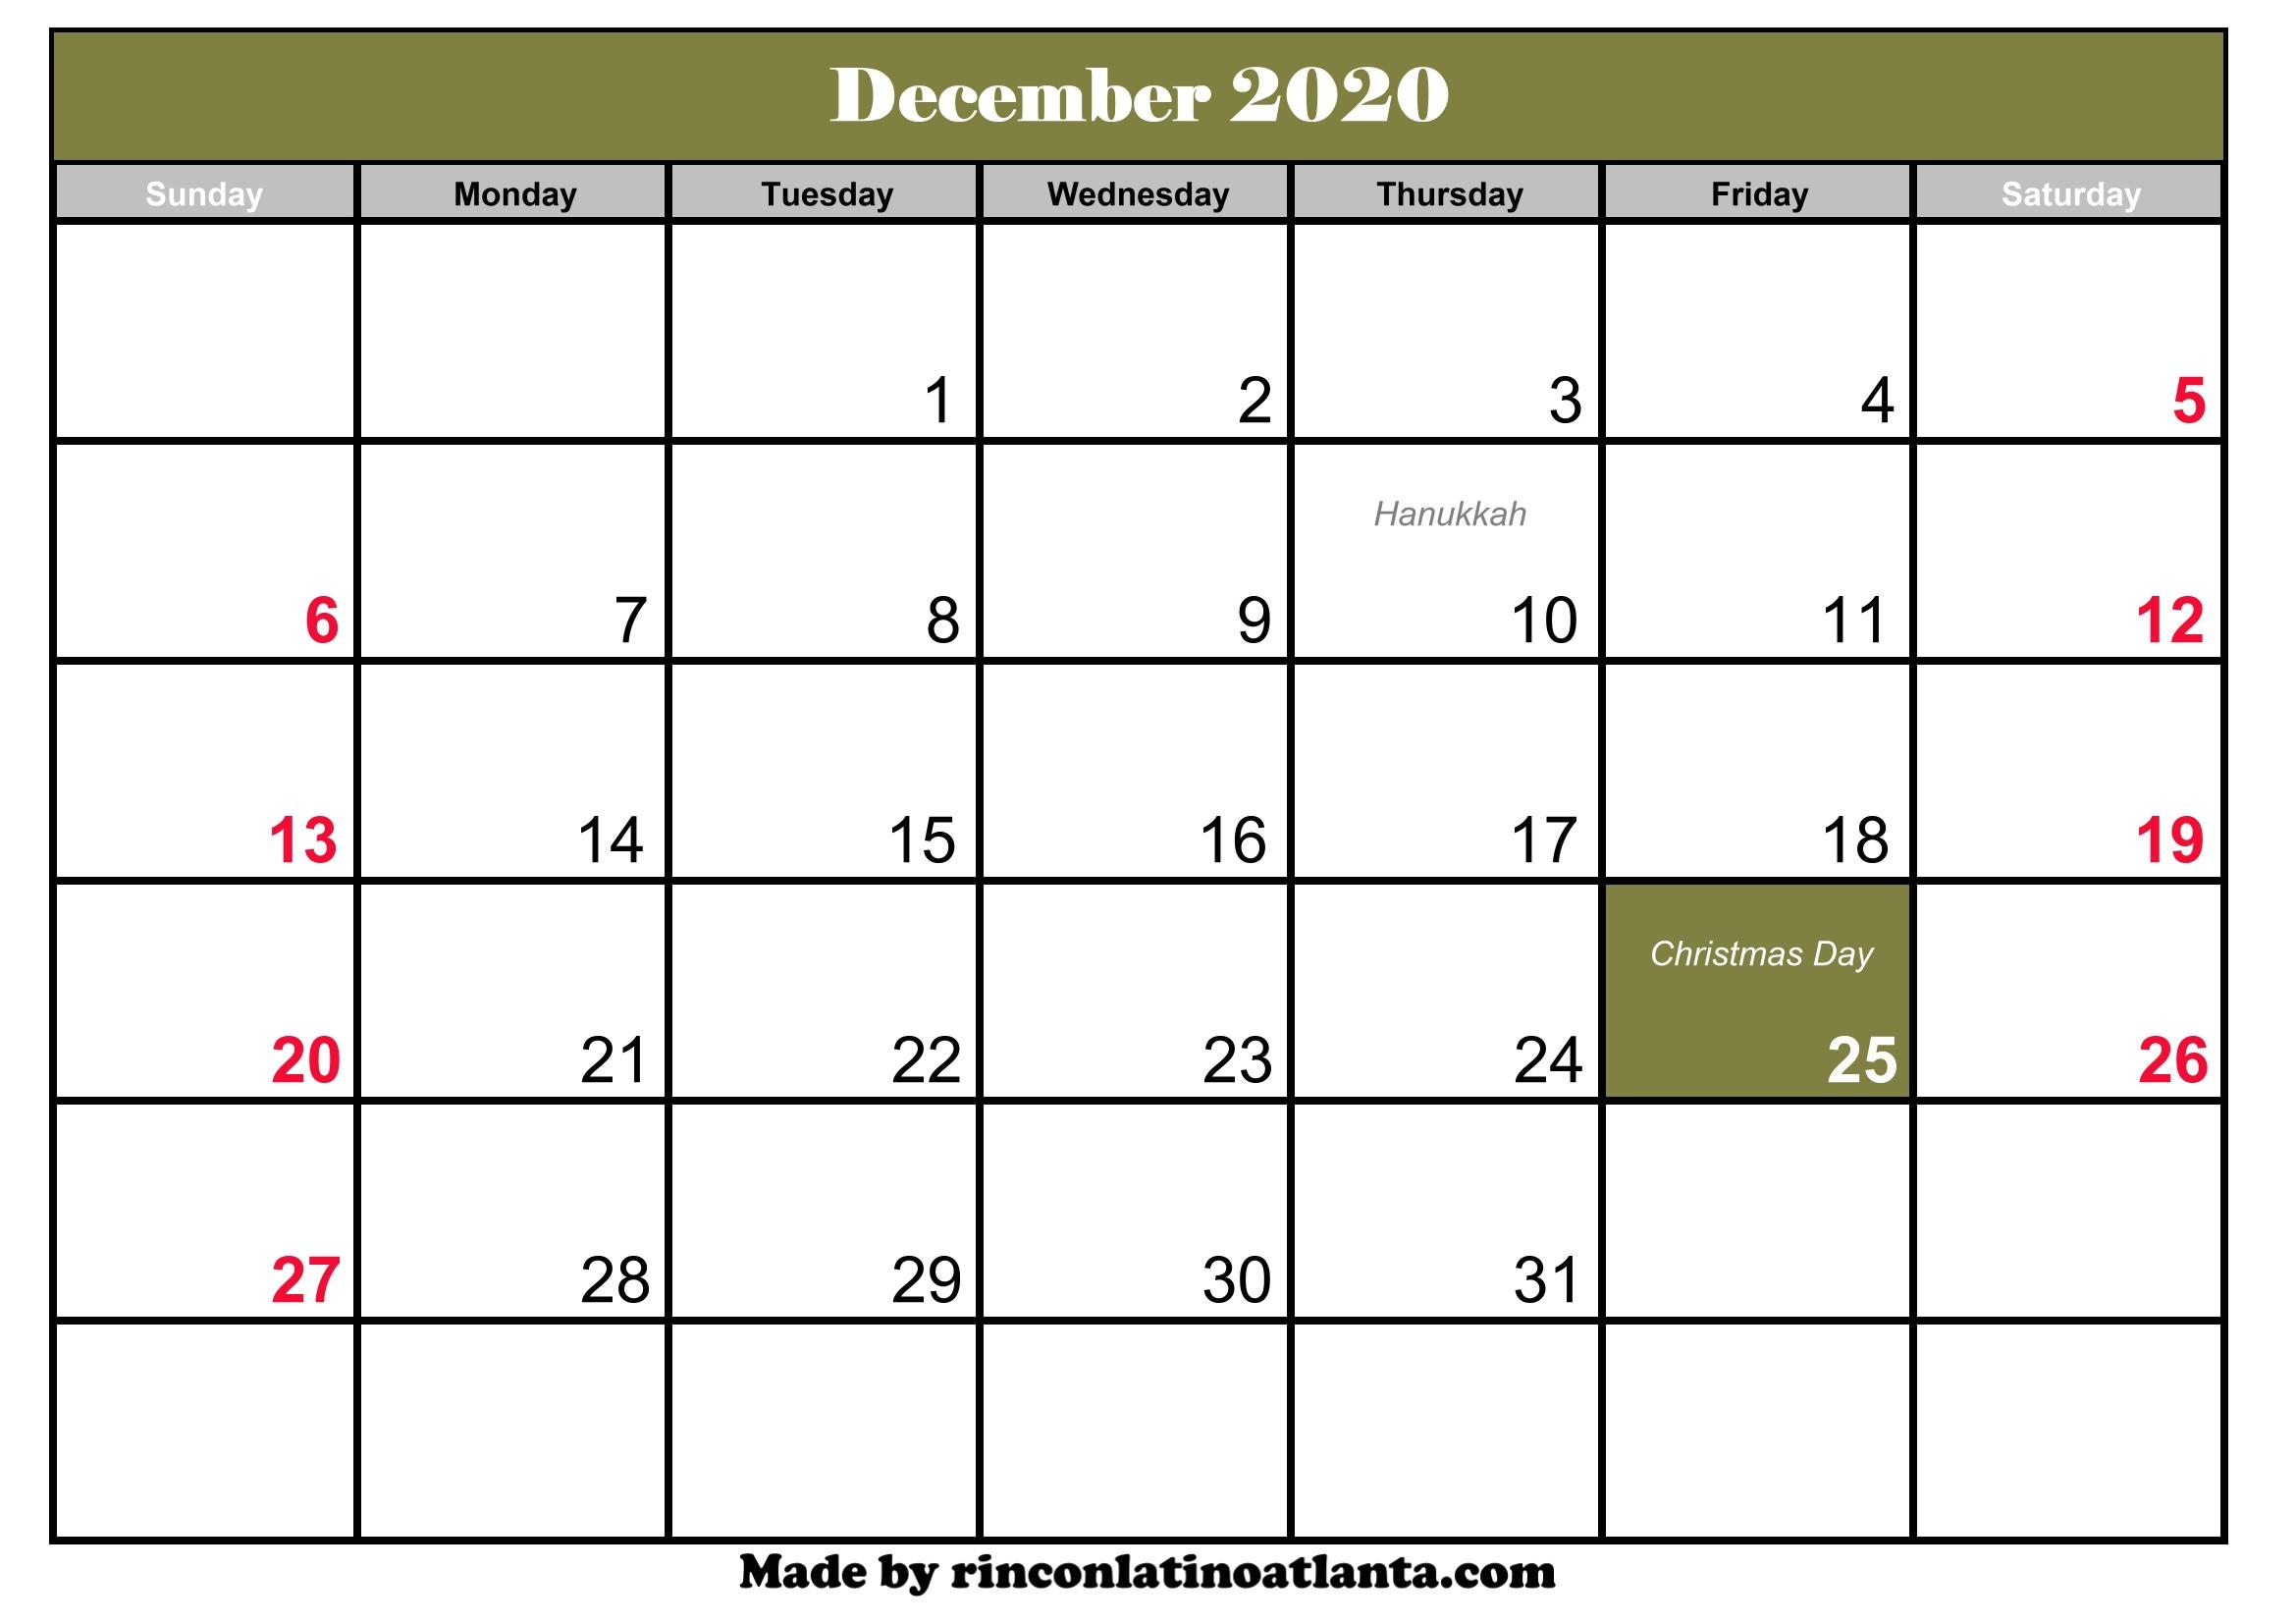 December 2020 Calendar Header December 2020 Calendar with Holidays | Calendar Template Printable